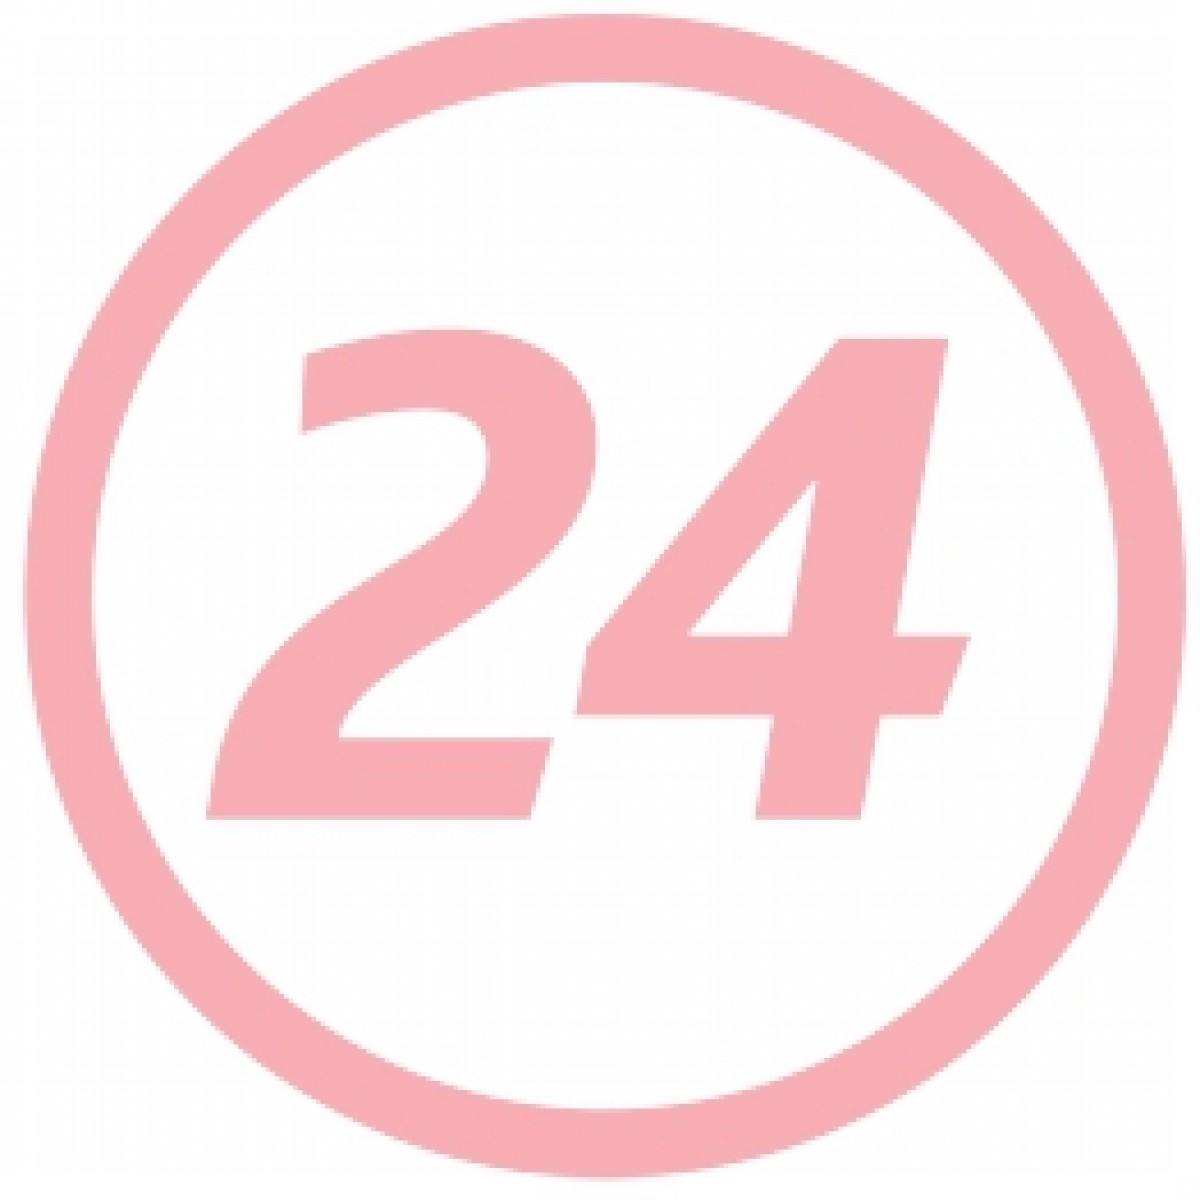 VICHY Liftactiv FlexiTeint 25 Nude, Fond de Ten, 30ml